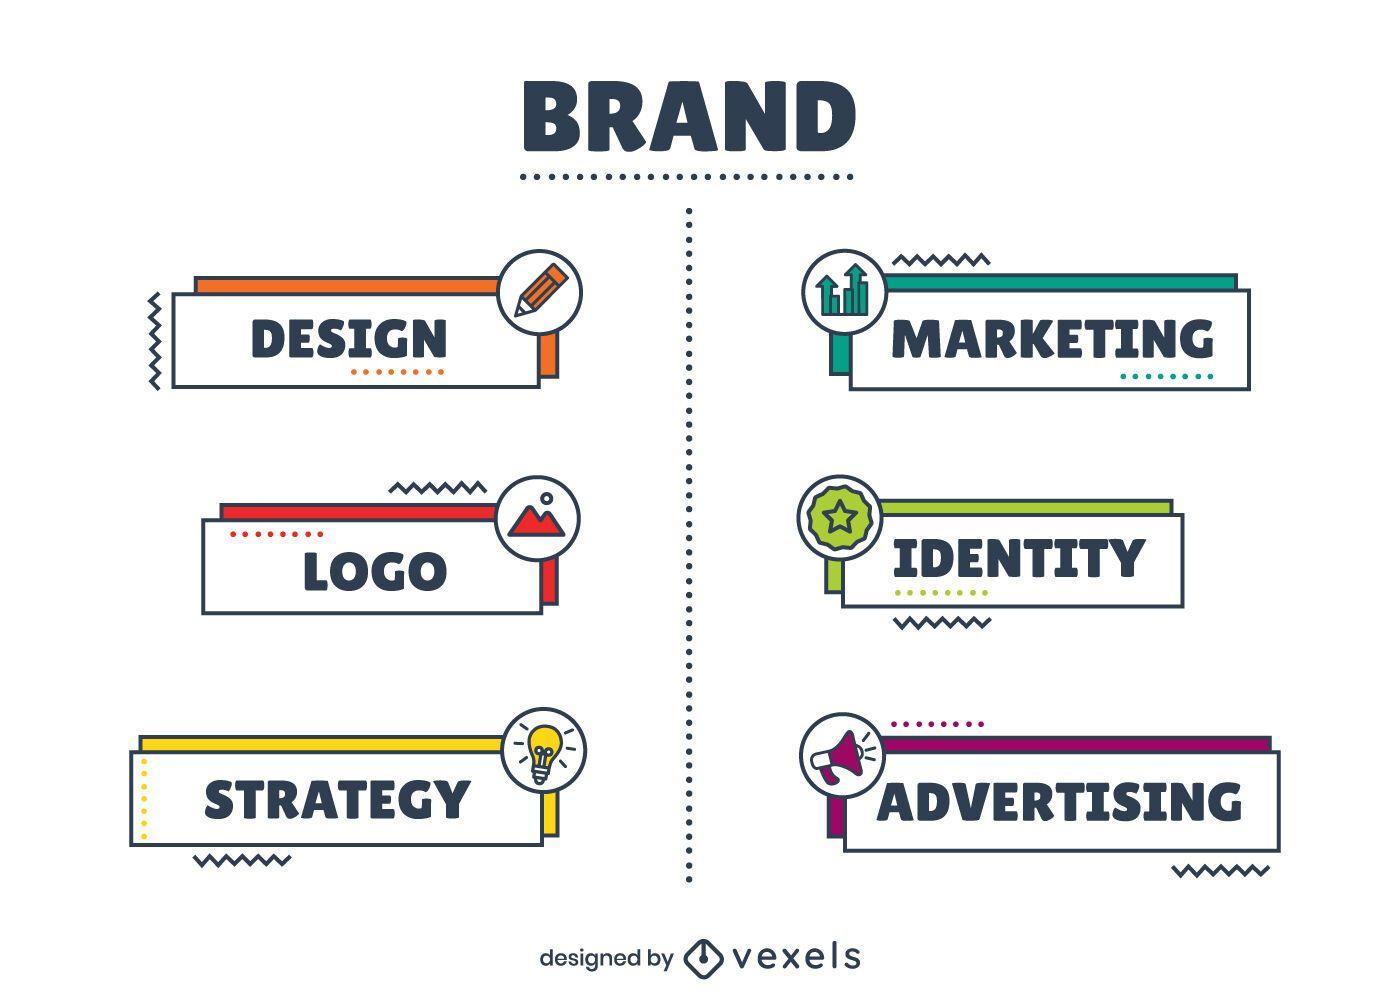 Brand Elements Infographic Design